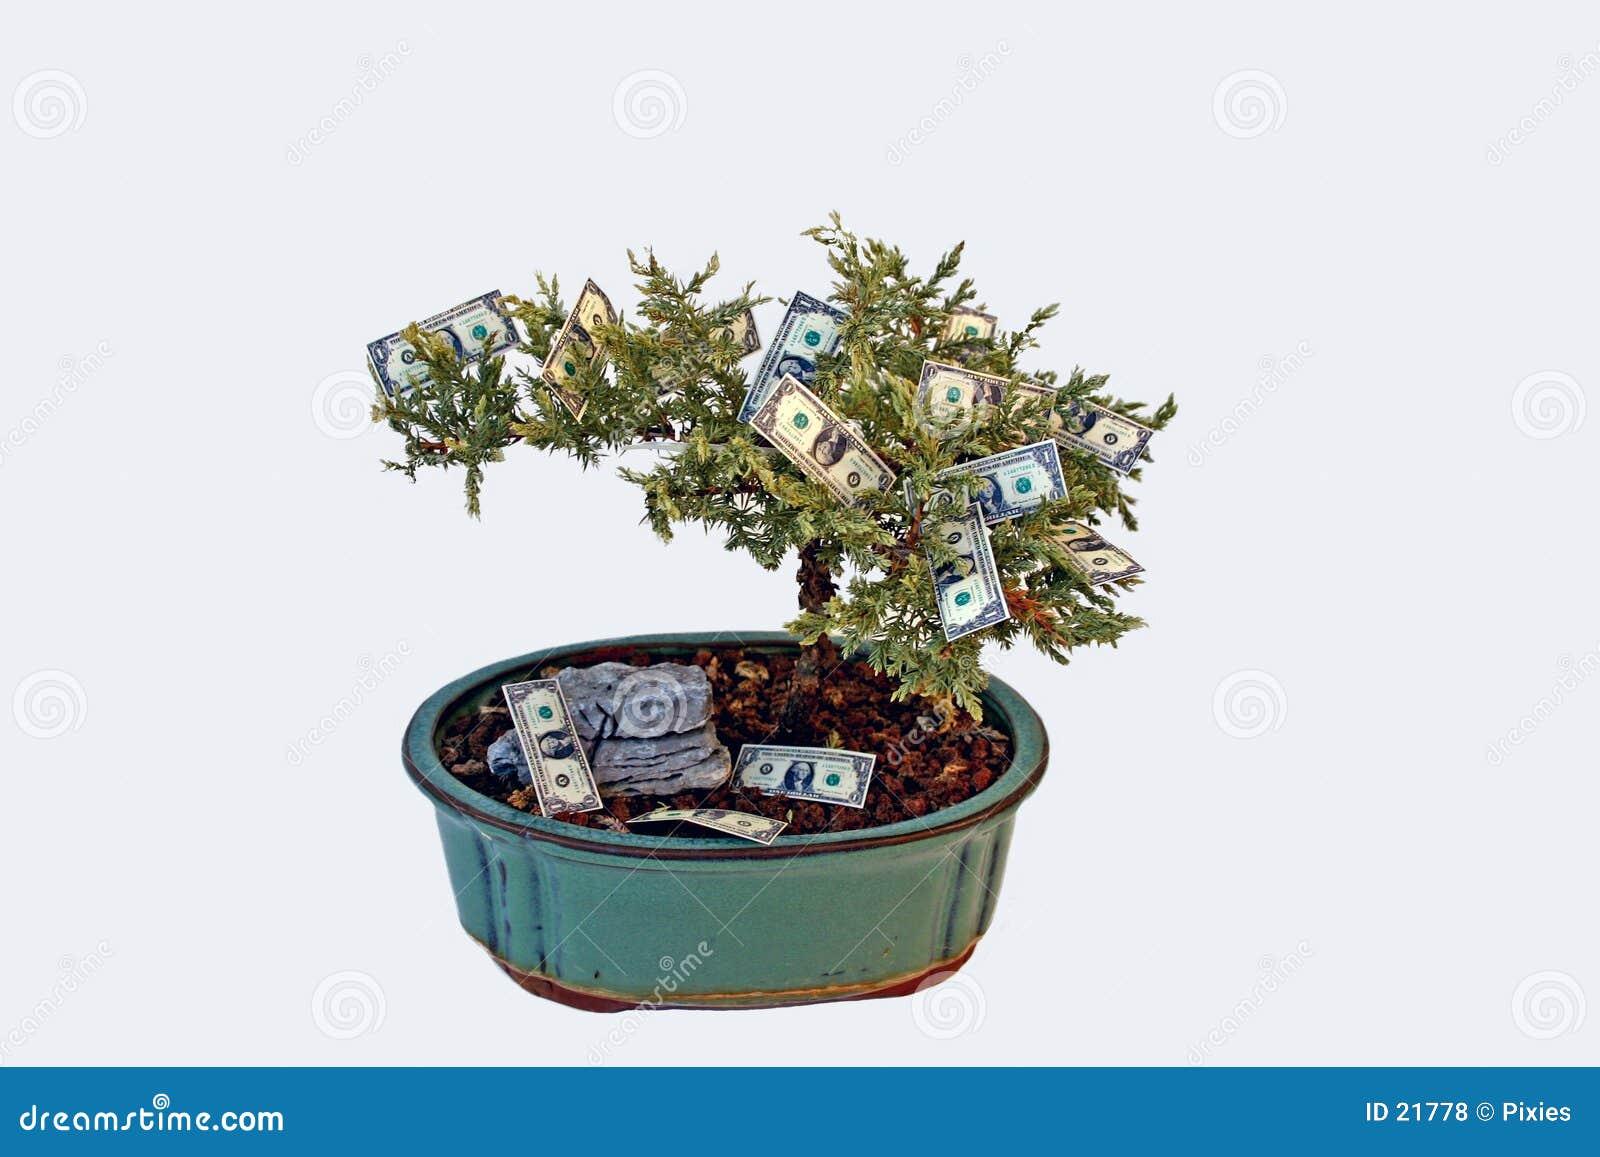 Money Grows on Trees?